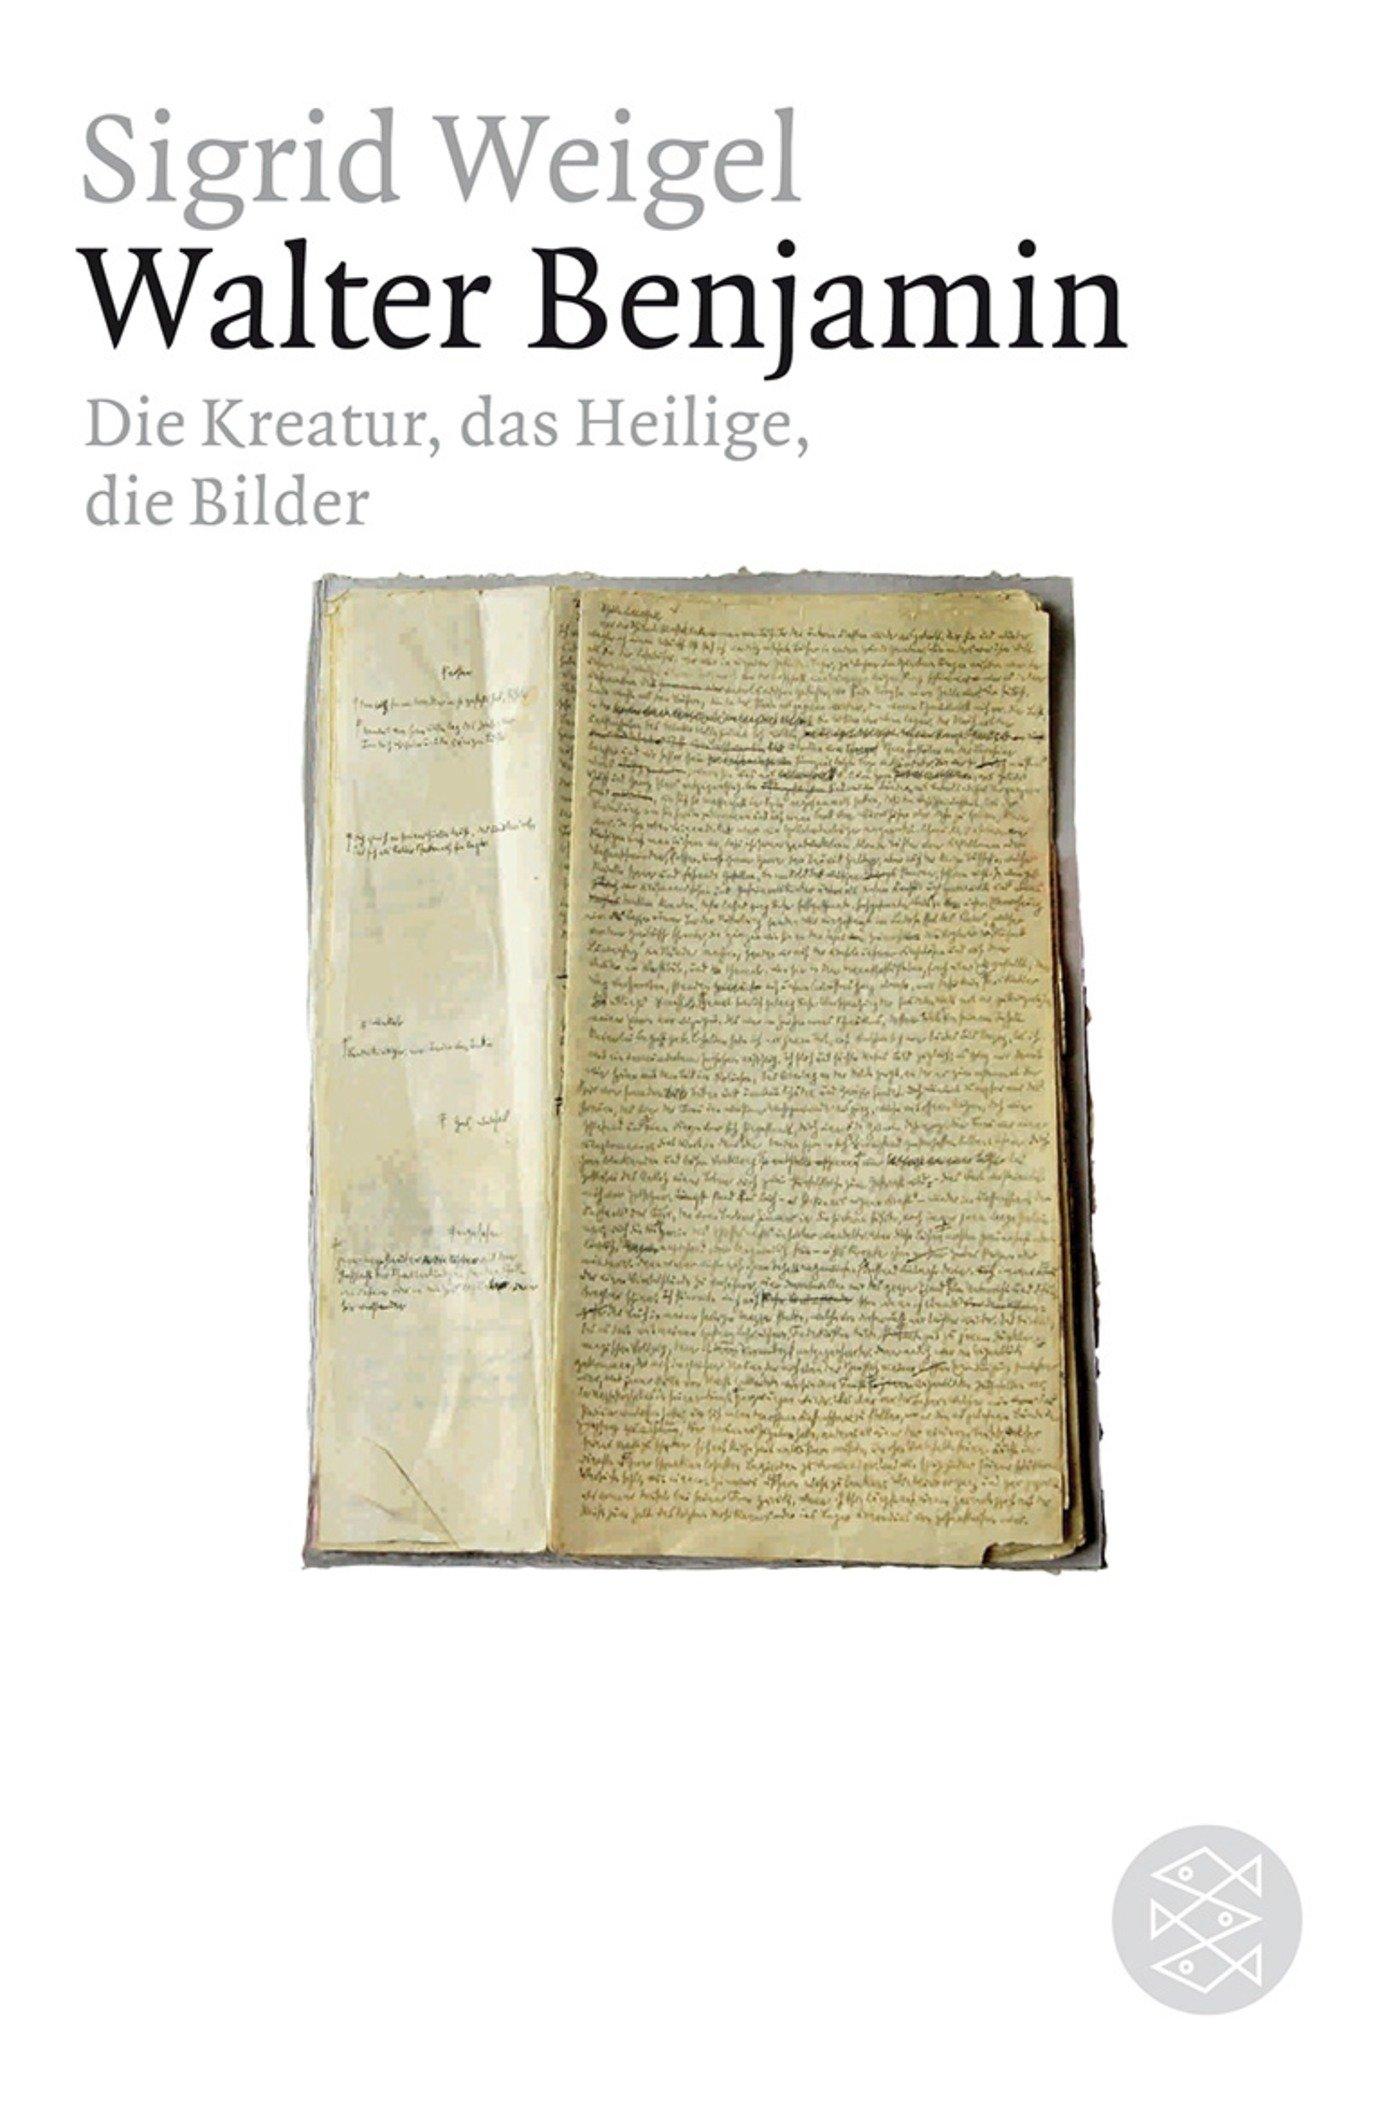 Walter Benjamin: Die Kreatur, das Heilige, die Bilder (Figuren des Wissens/Bibliothek)